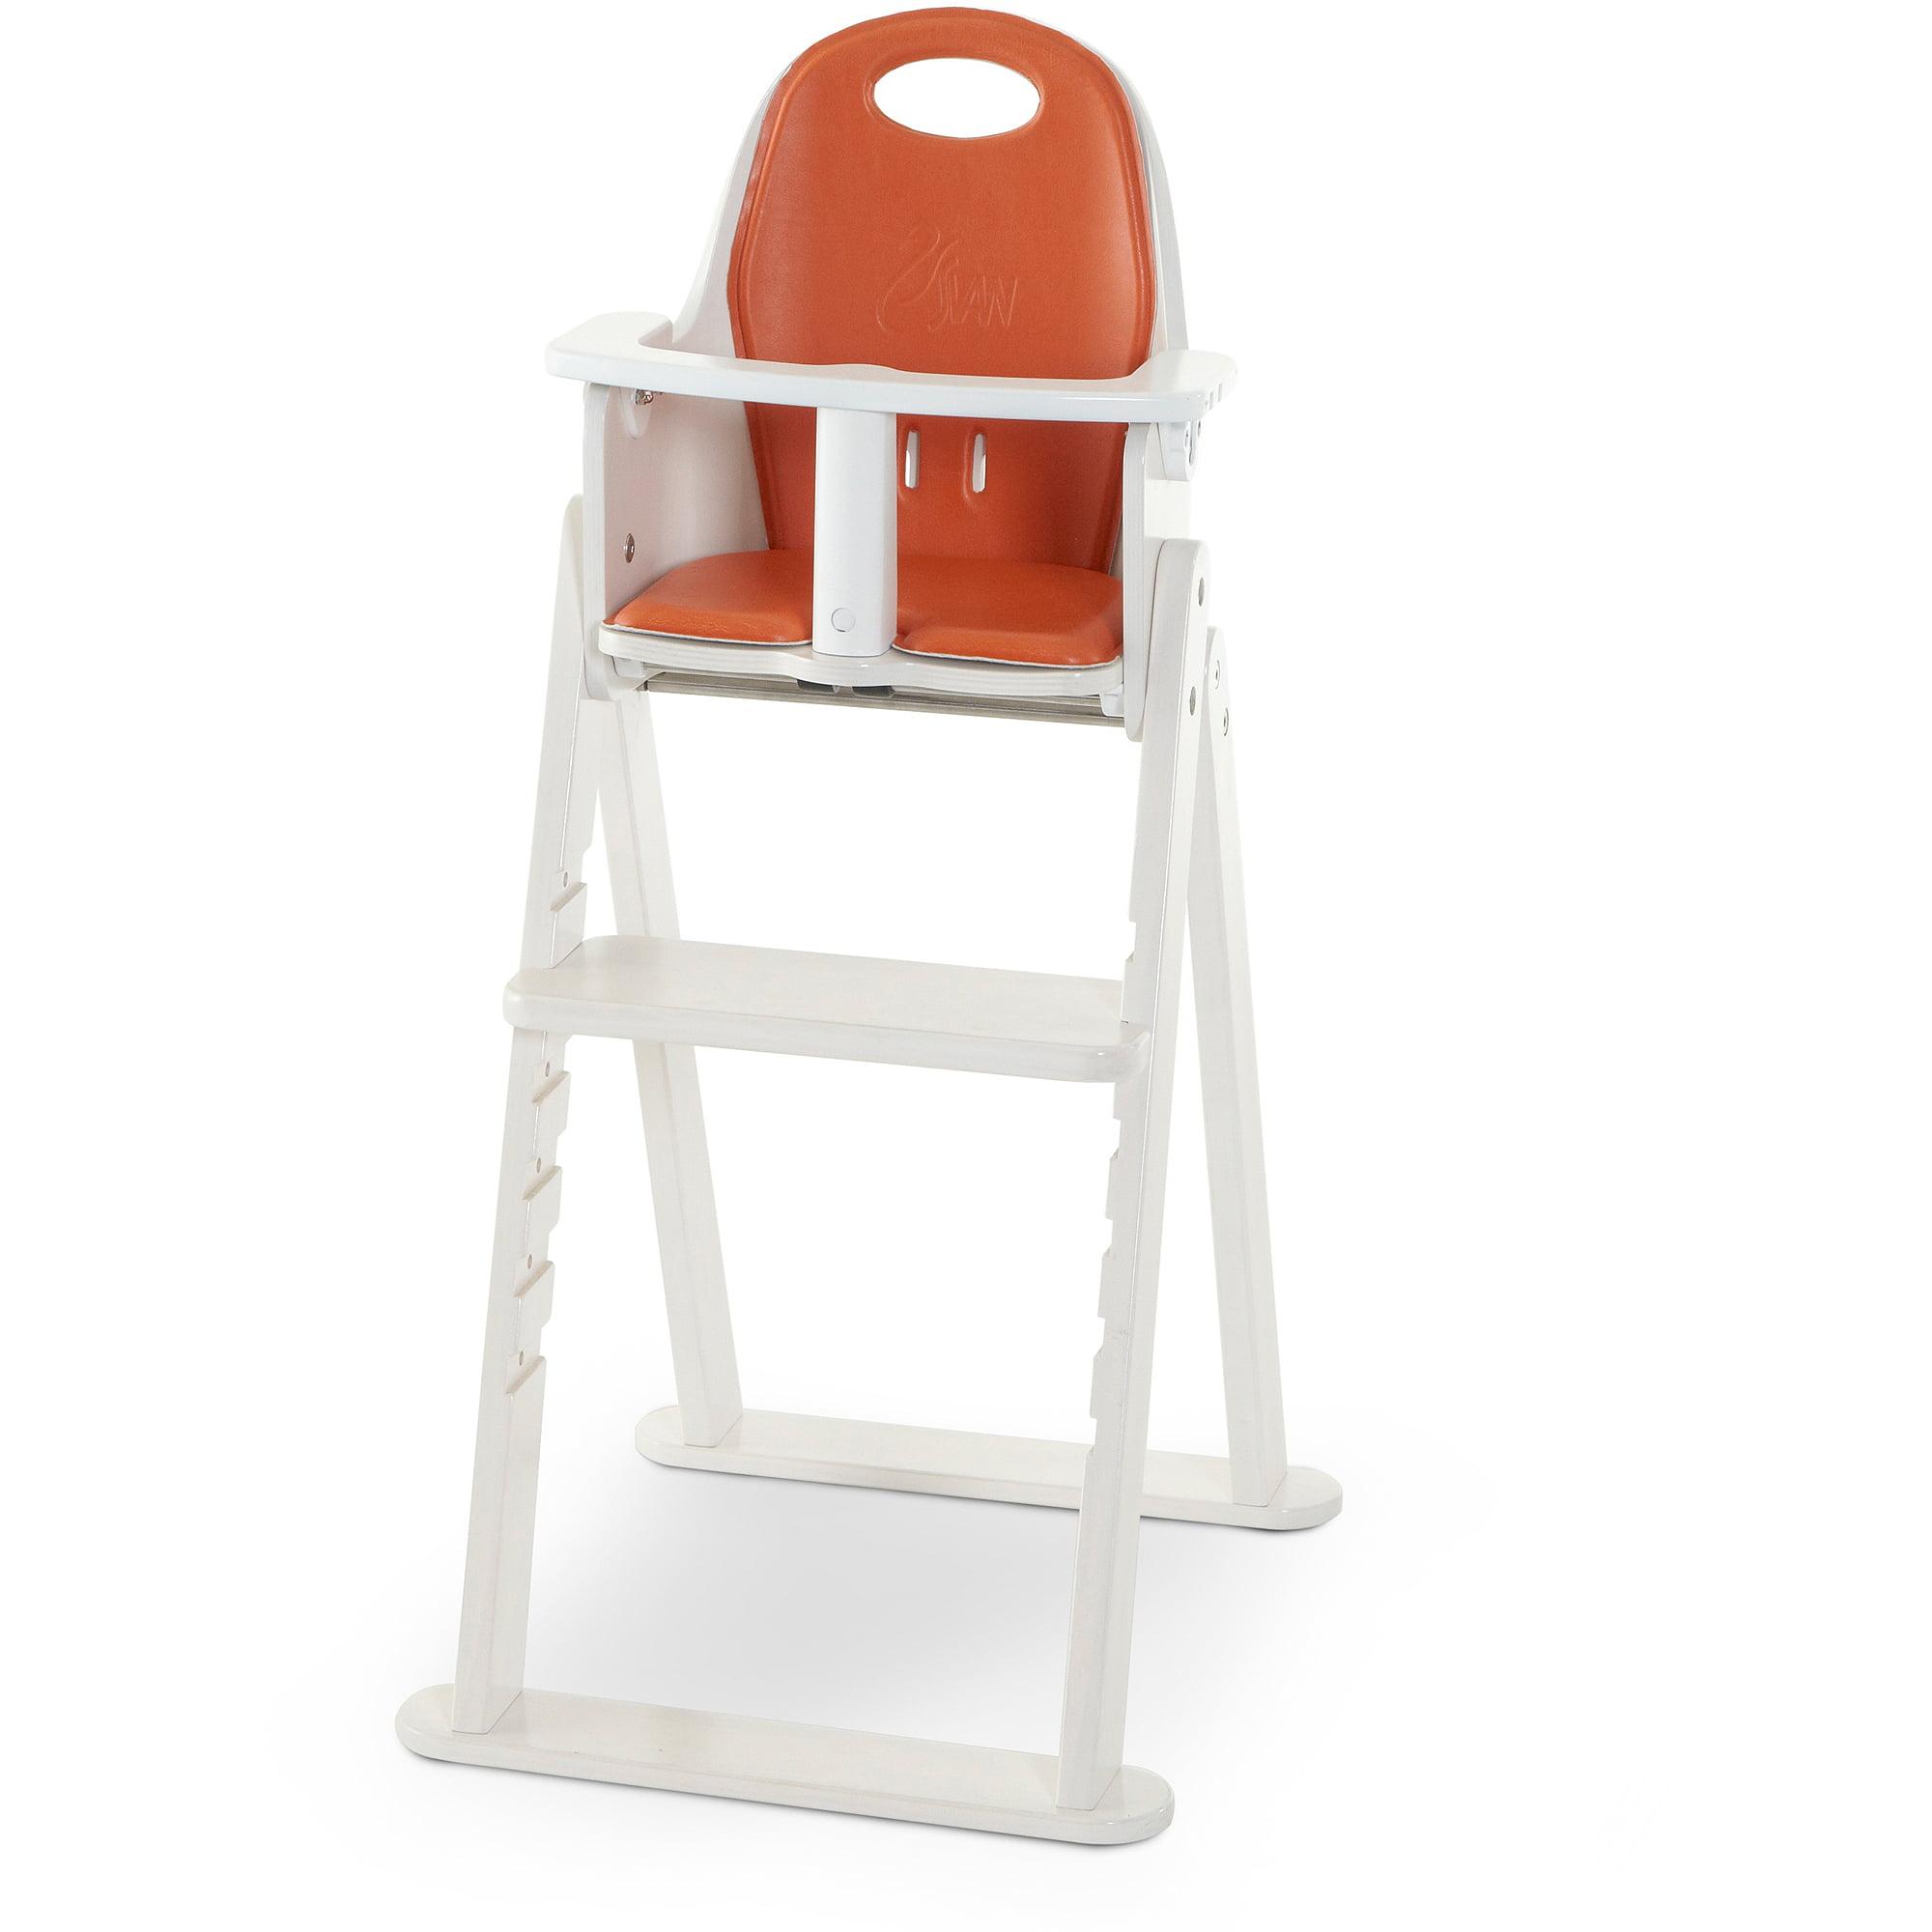 Svan Baby To Booster Bentwood High Chair, White/Tangerine Cushion    Walmart.com